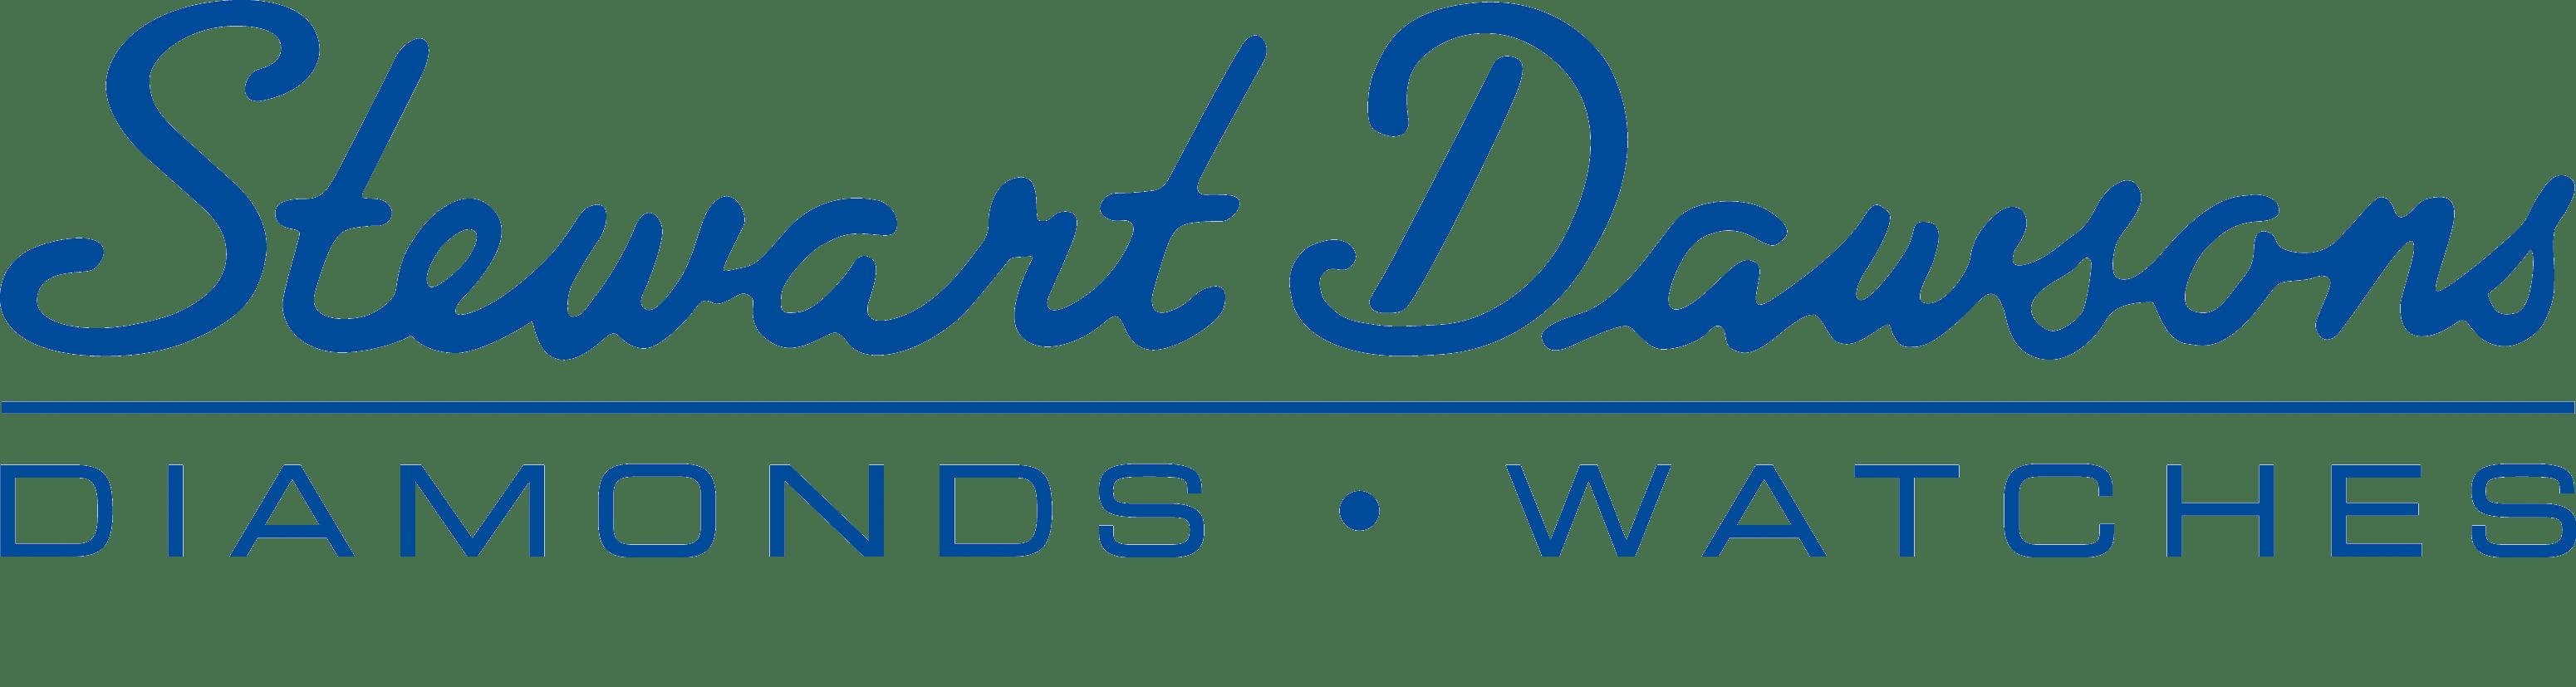 Stewart Dawsons Jewellers